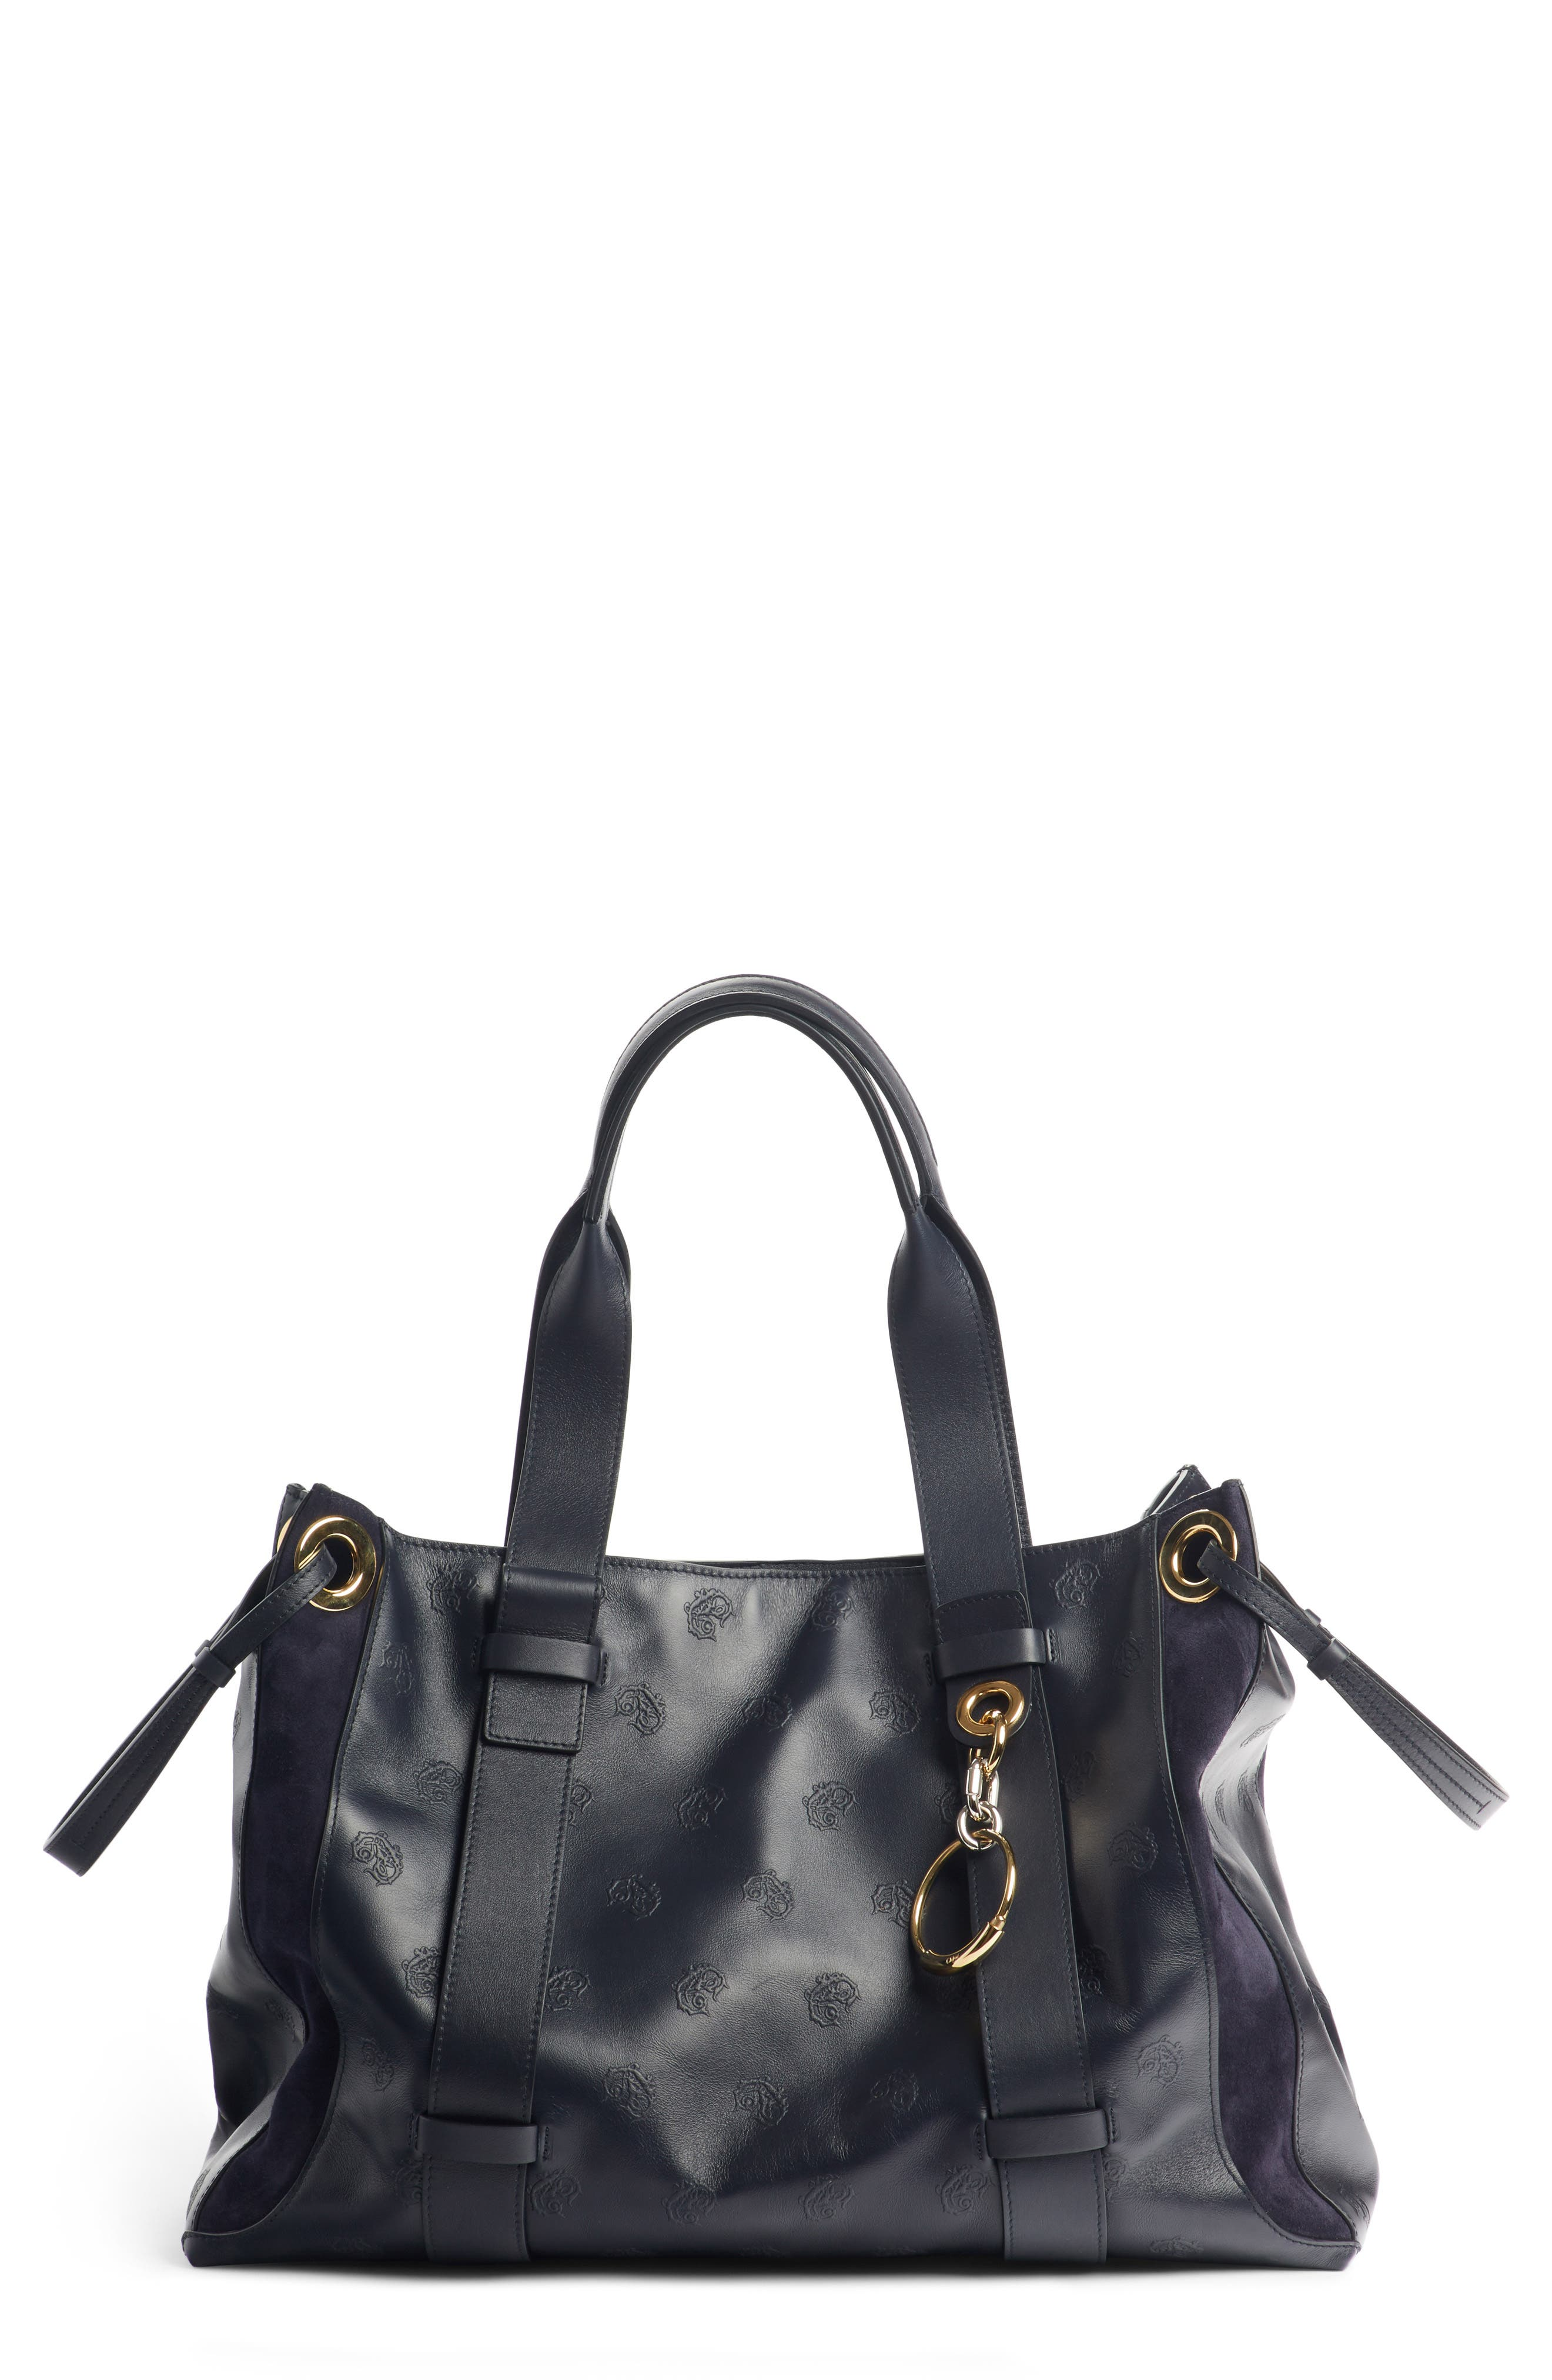 Medium Tao Embossed Leather Satchel,                         Main,                         color, 401